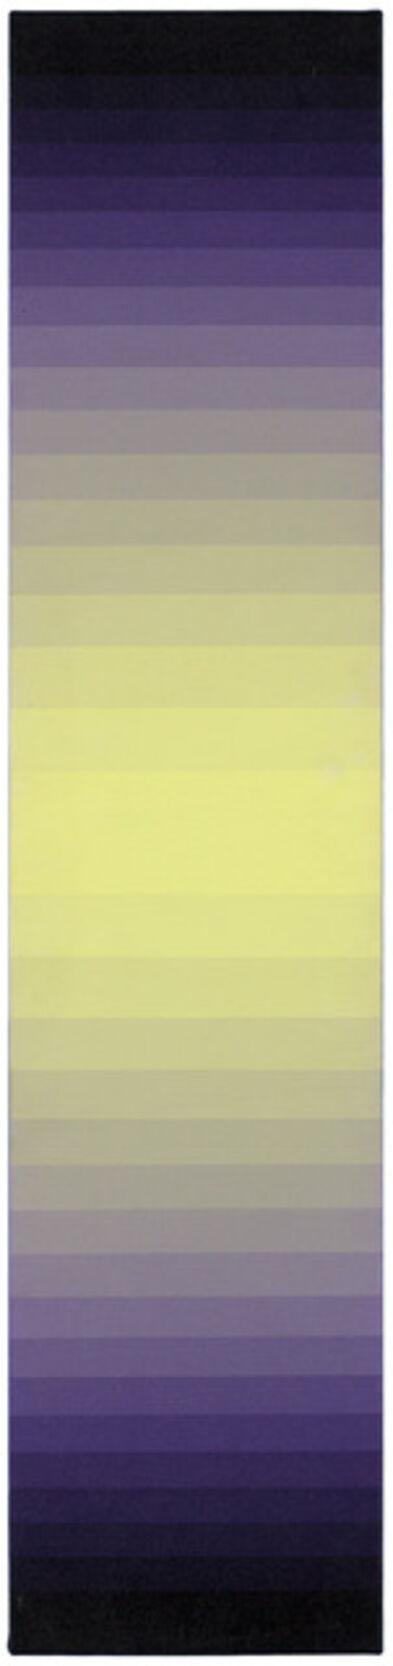 Norman Zammitt, 'Yellow to Violet II', 1978-1981